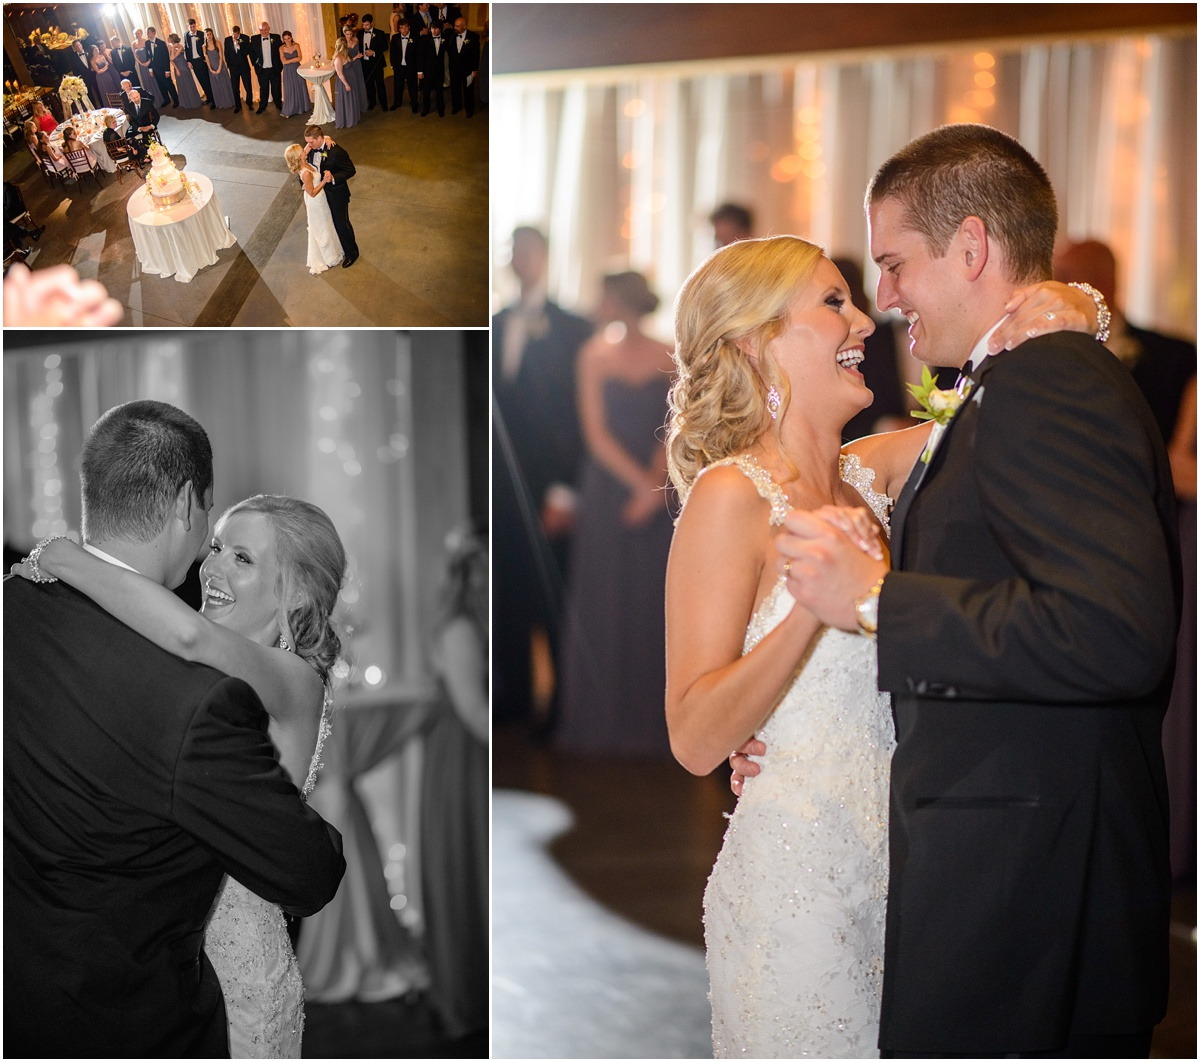 Greg Smit Photography Mint Springs Farm Nashville Tennessee wedding photographer_0371